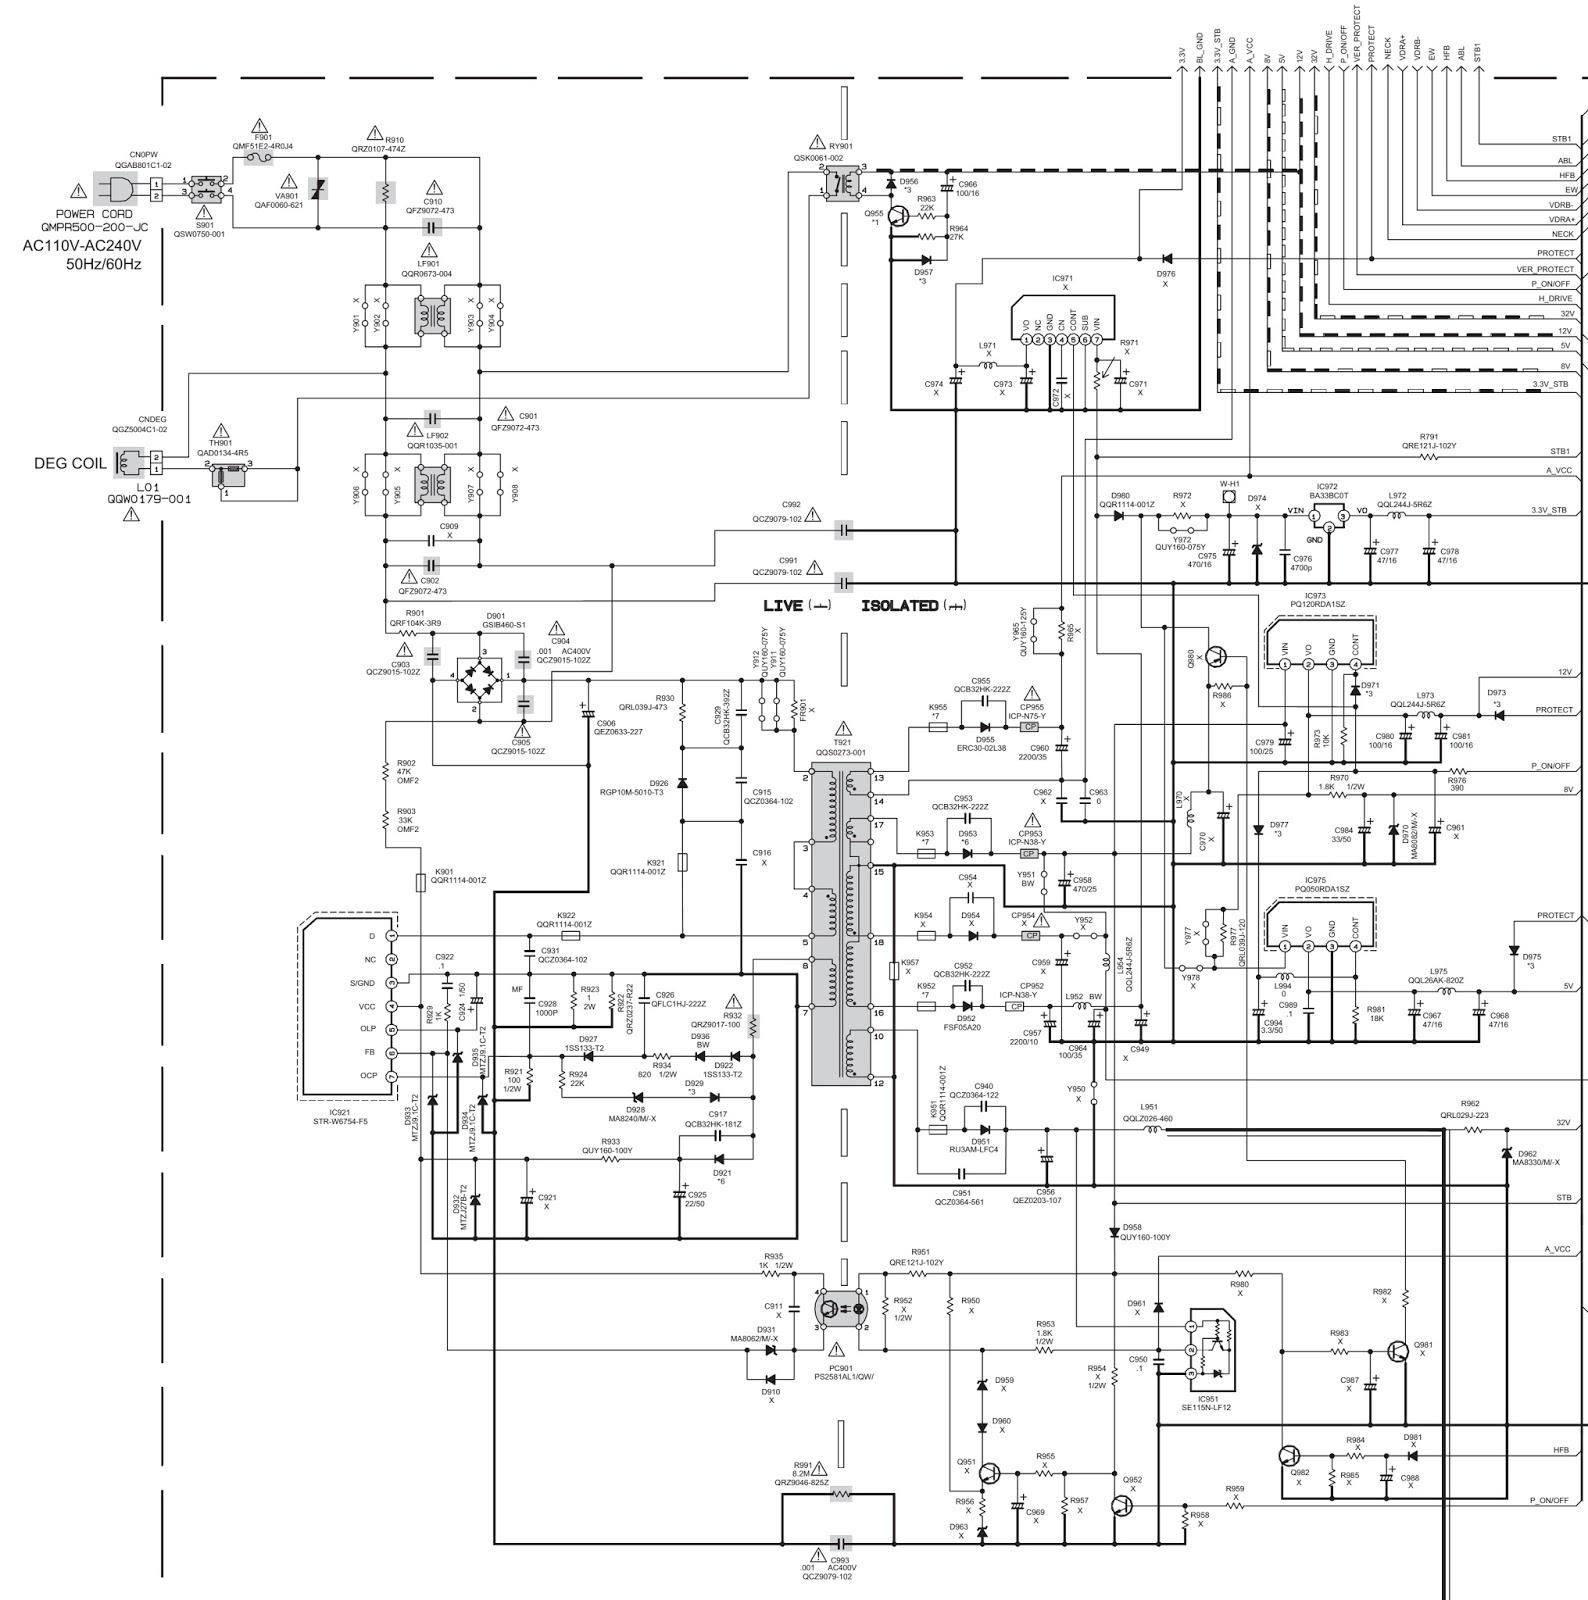 JVC AV17V214  TV  POWER SUPPLY [SMPS]  SCHEMATIC